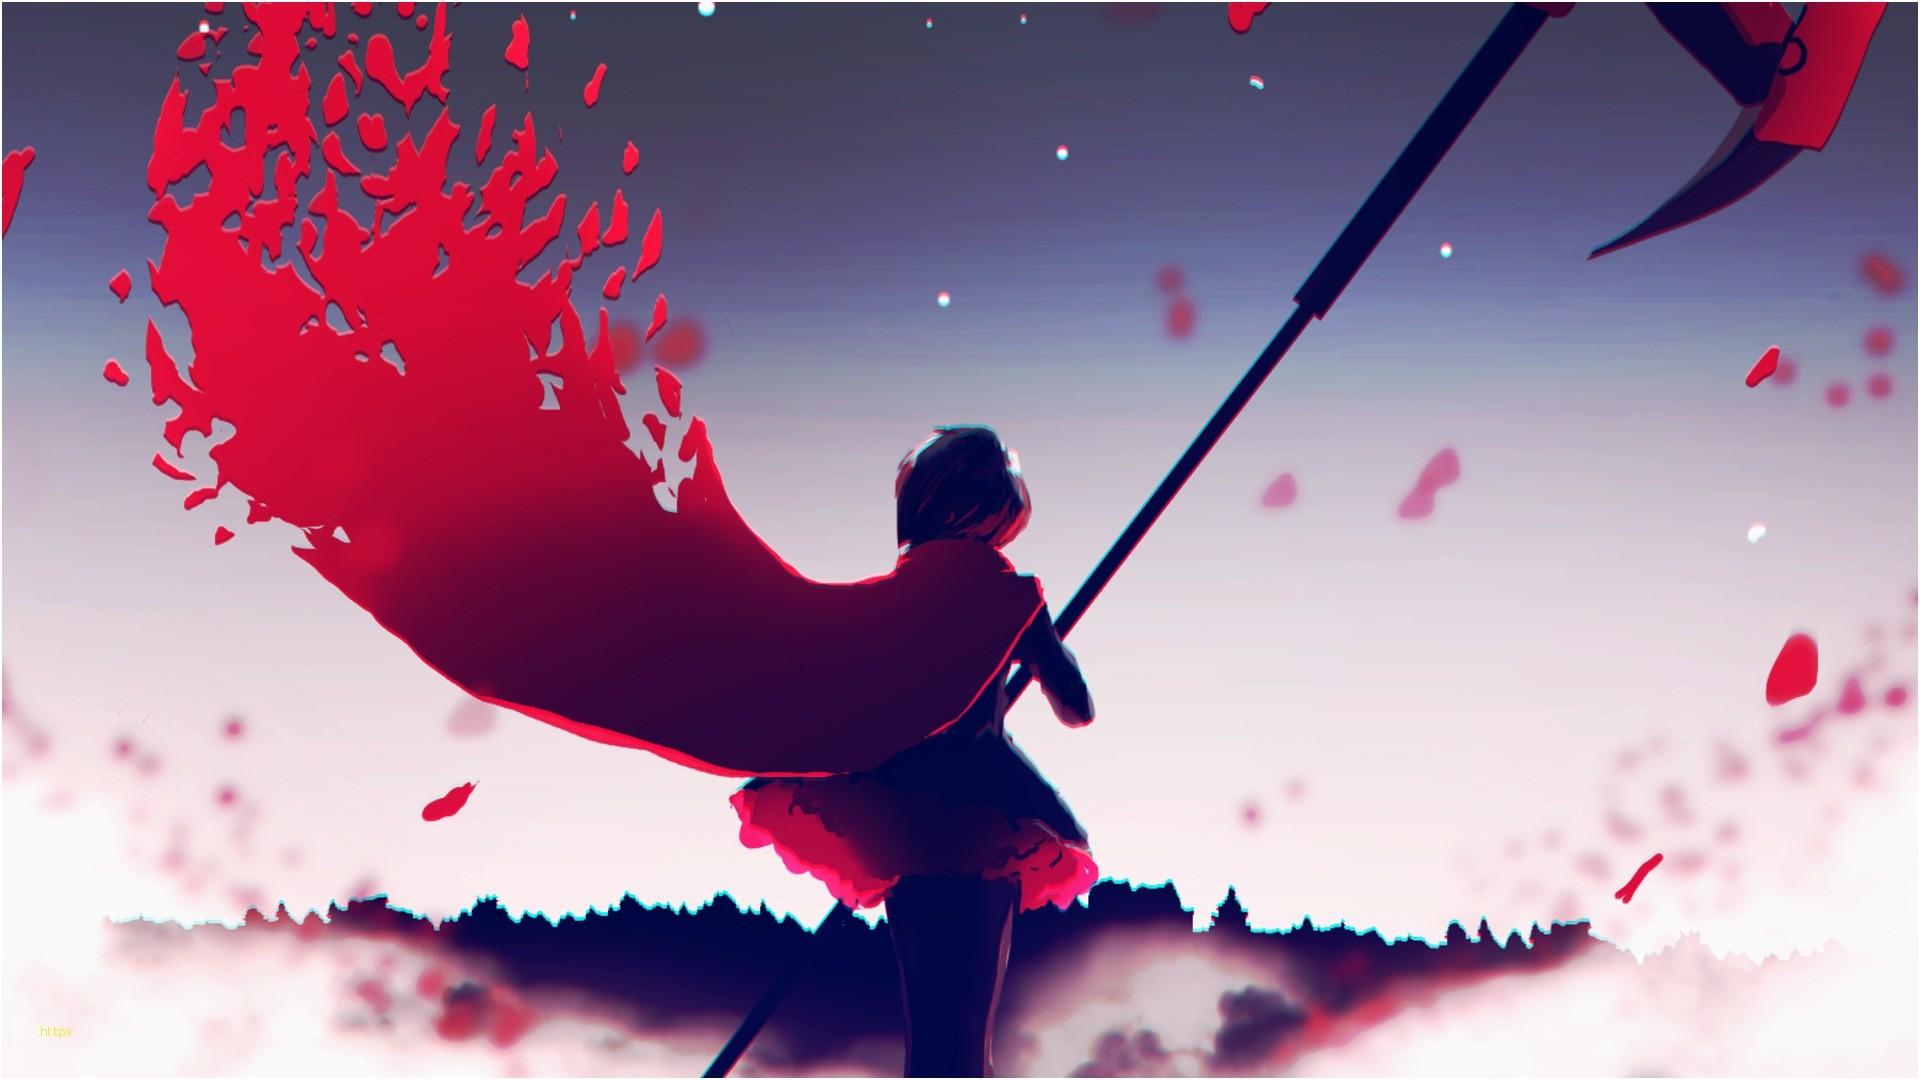 Res: 1920x1080, Otaku Wallpaper Best Of Anime Anime Rwby Ruby Rose